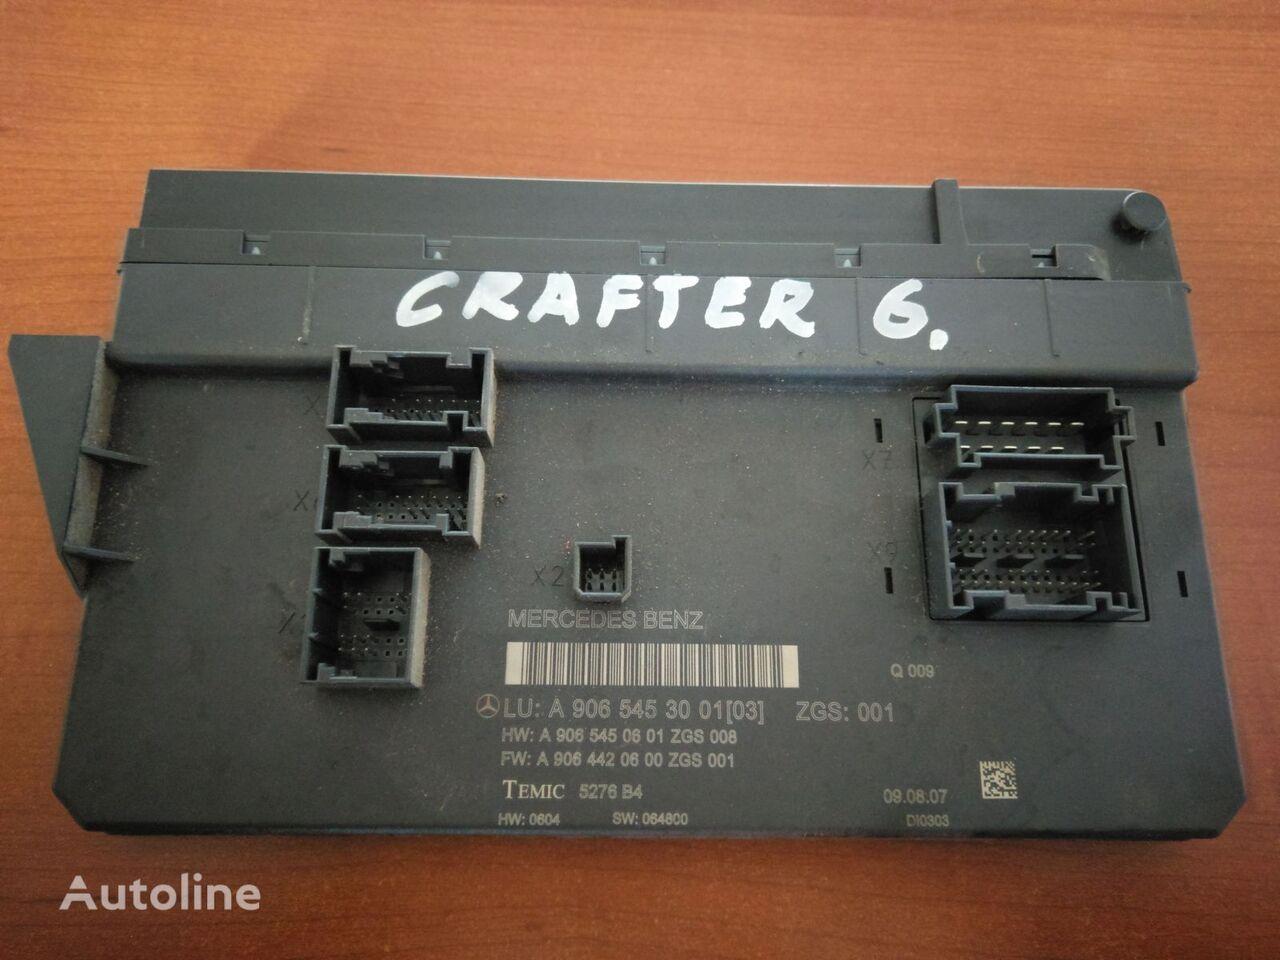 jednostka sterująca MERCEDES-BENZ CRAFTER A9065453001 5276B4 do samochodu MERCEDES-BENZ